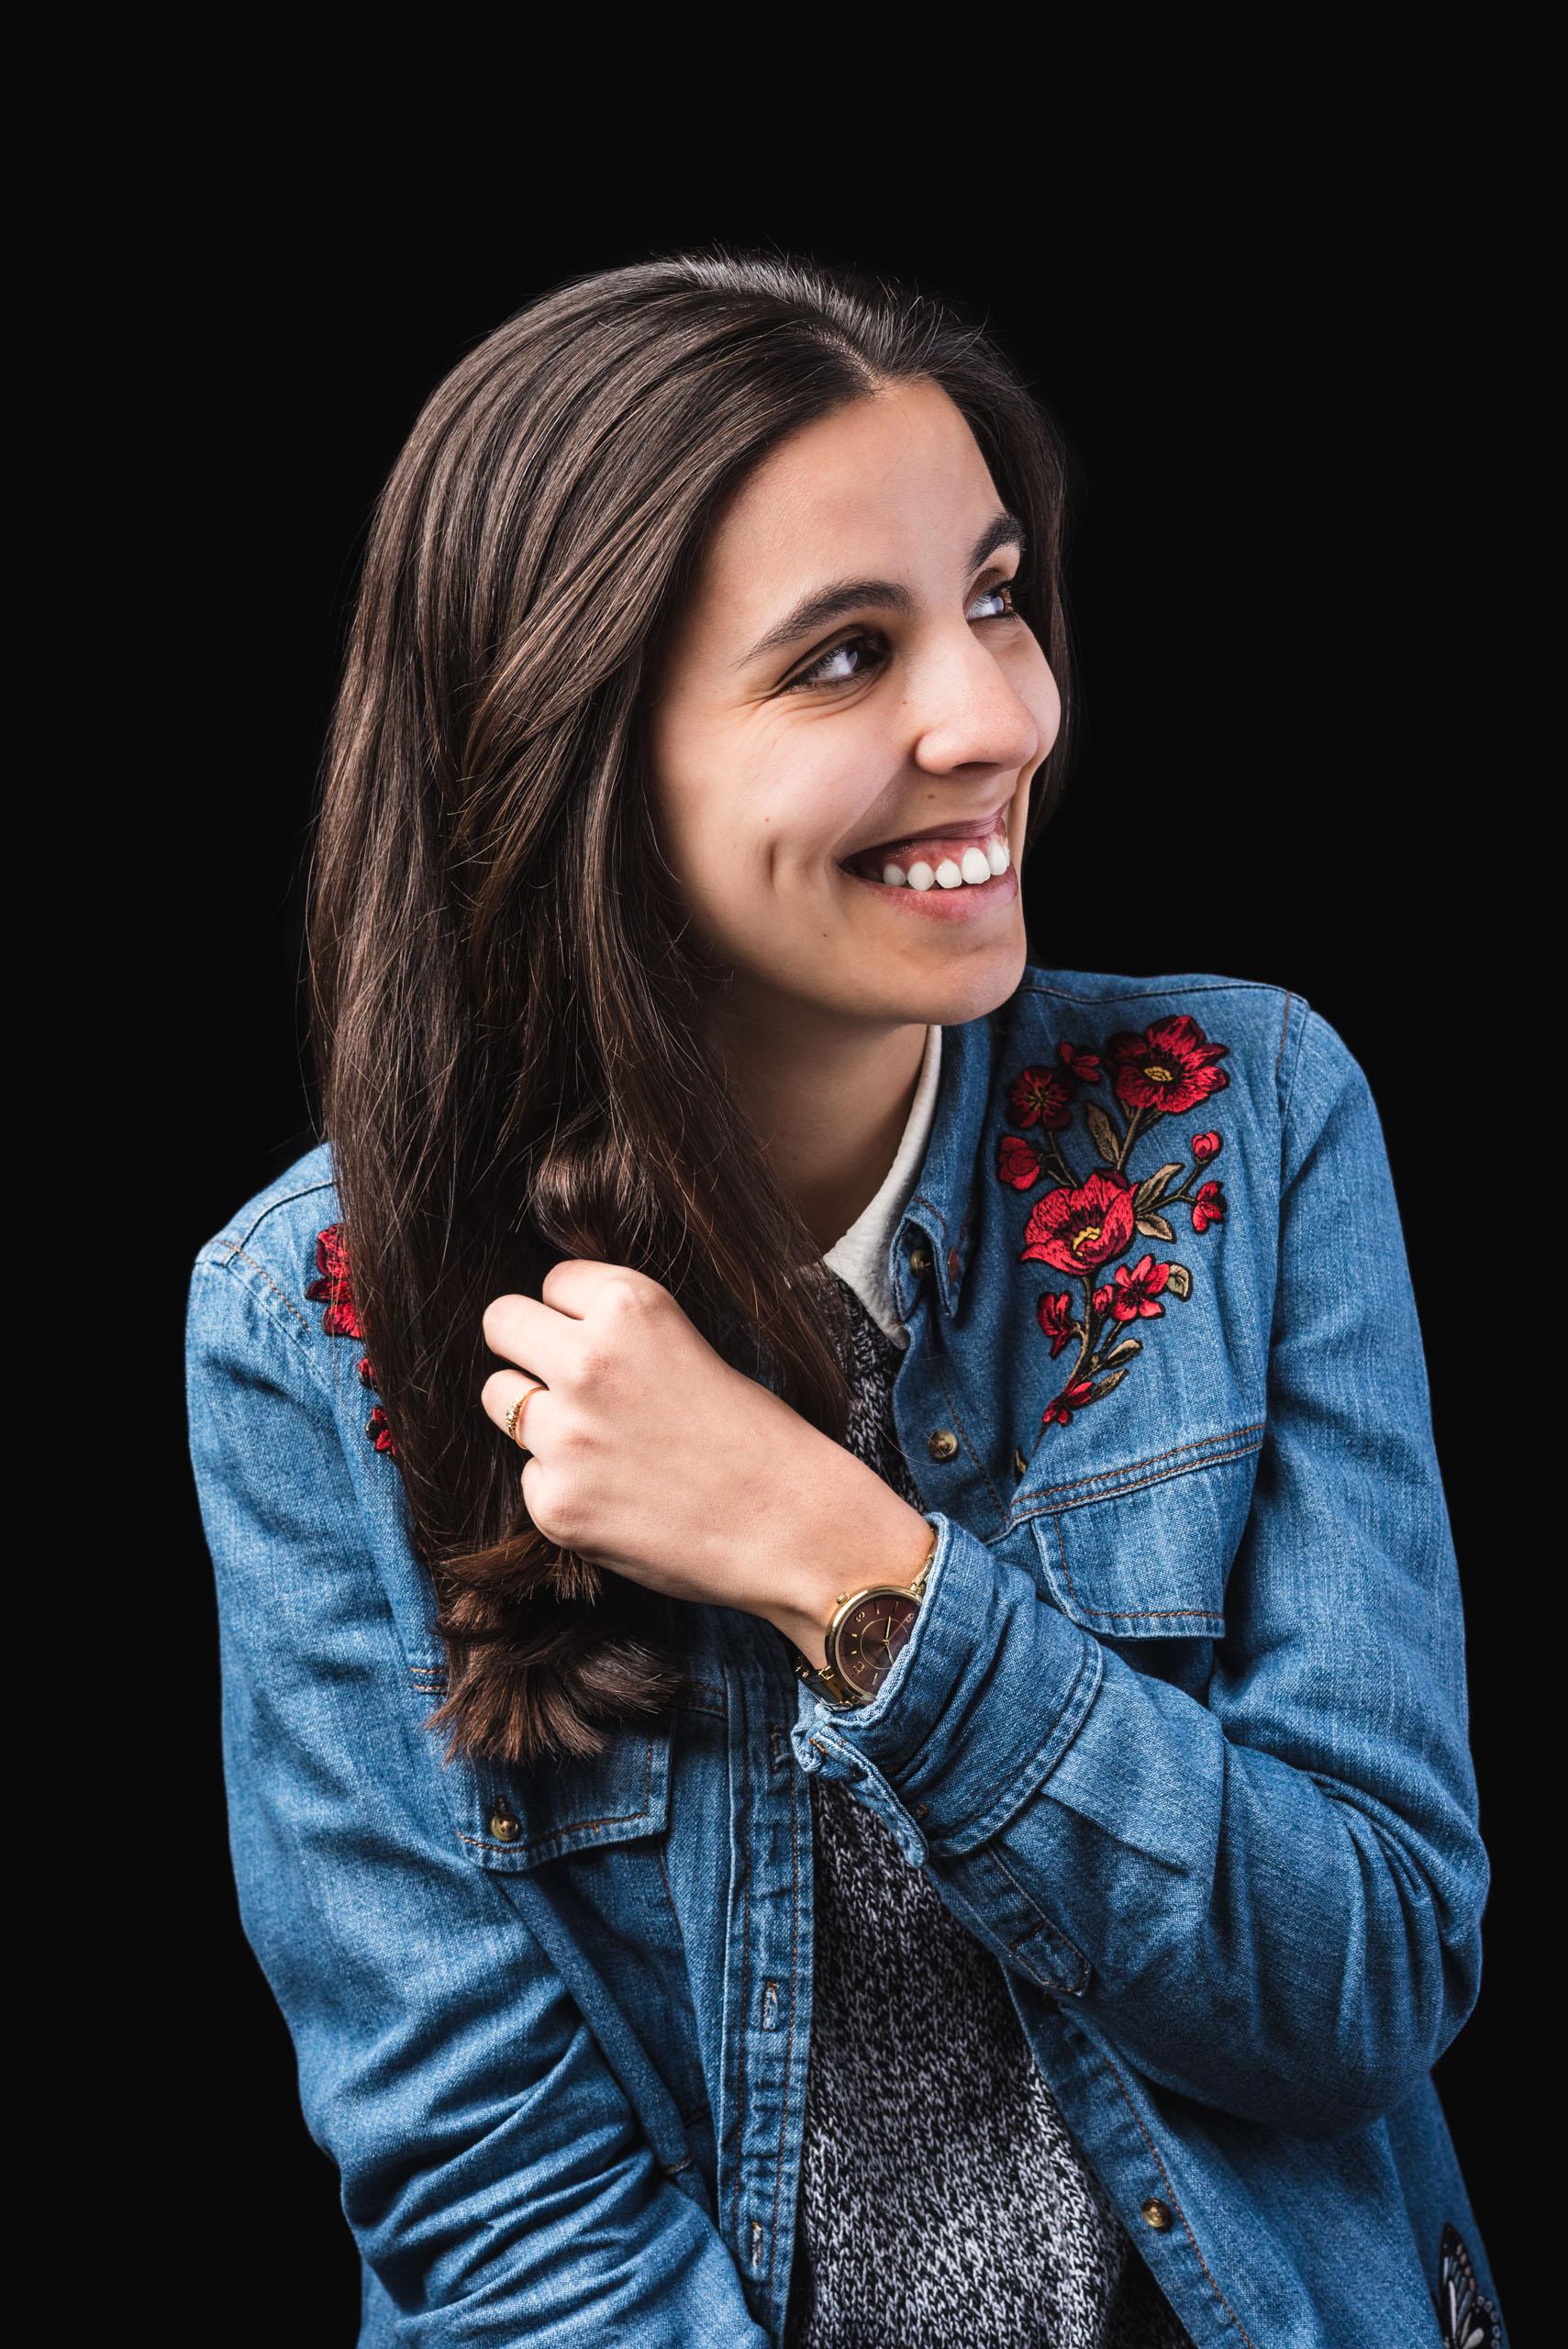 Laura Branco